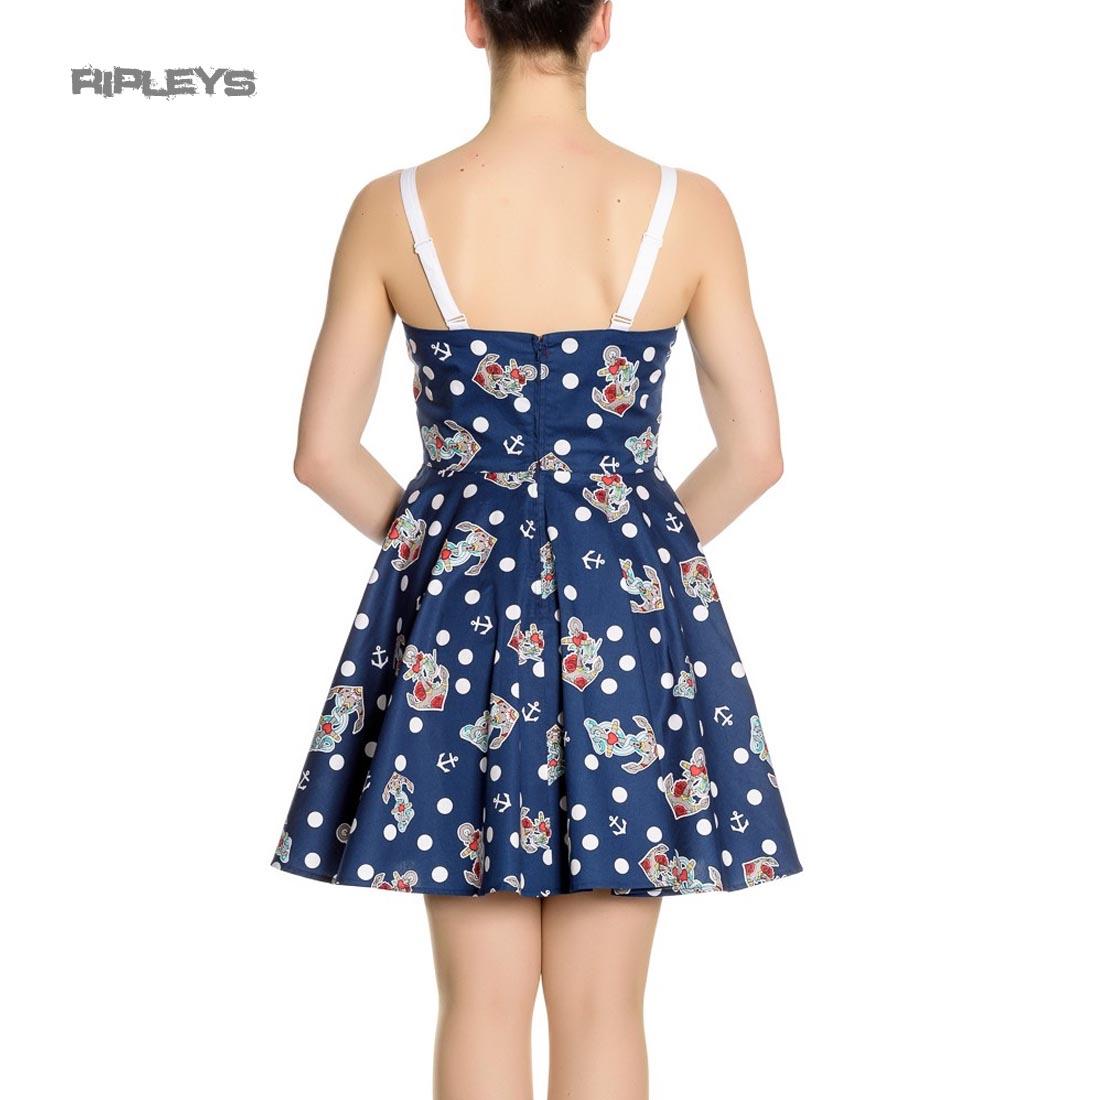 Hell-Bunny-Navy-Blue-50s-Nautical-Mini-Dress-OCEANA-Polka-Dot-All-Sizes thumbnail 28